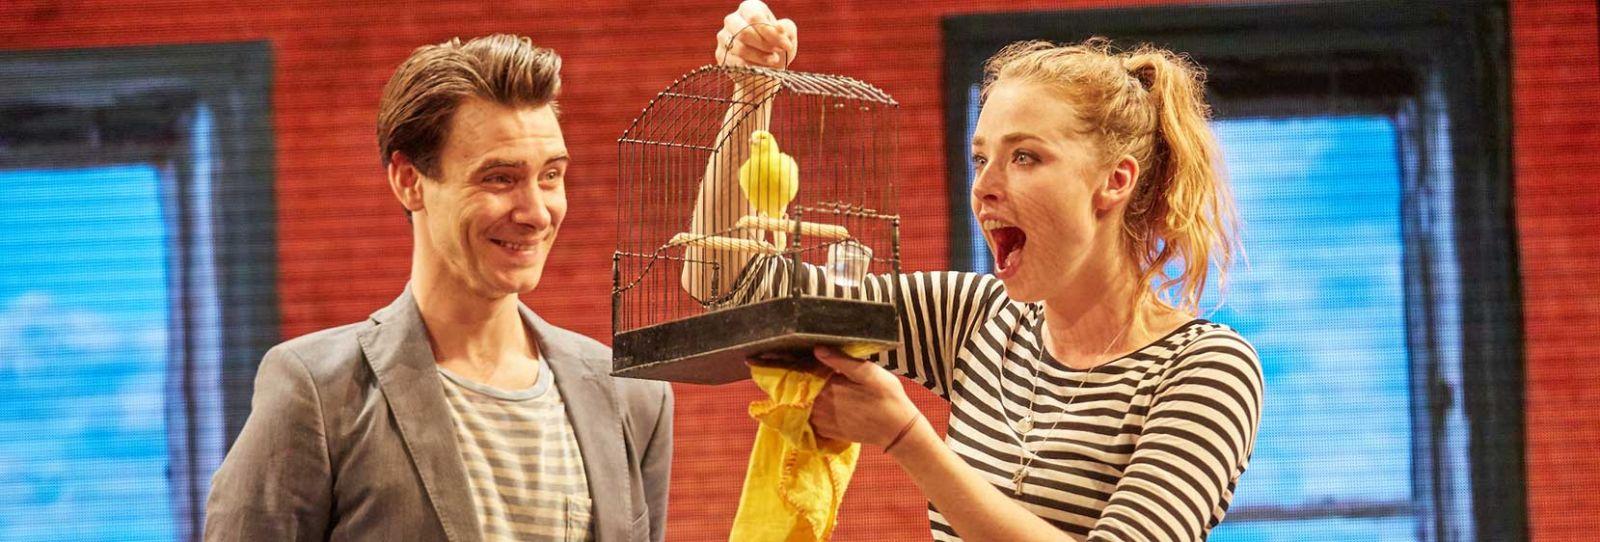 Freya Mavor and John Malkovich nominated for Evening Standard Theatre Awards 2016